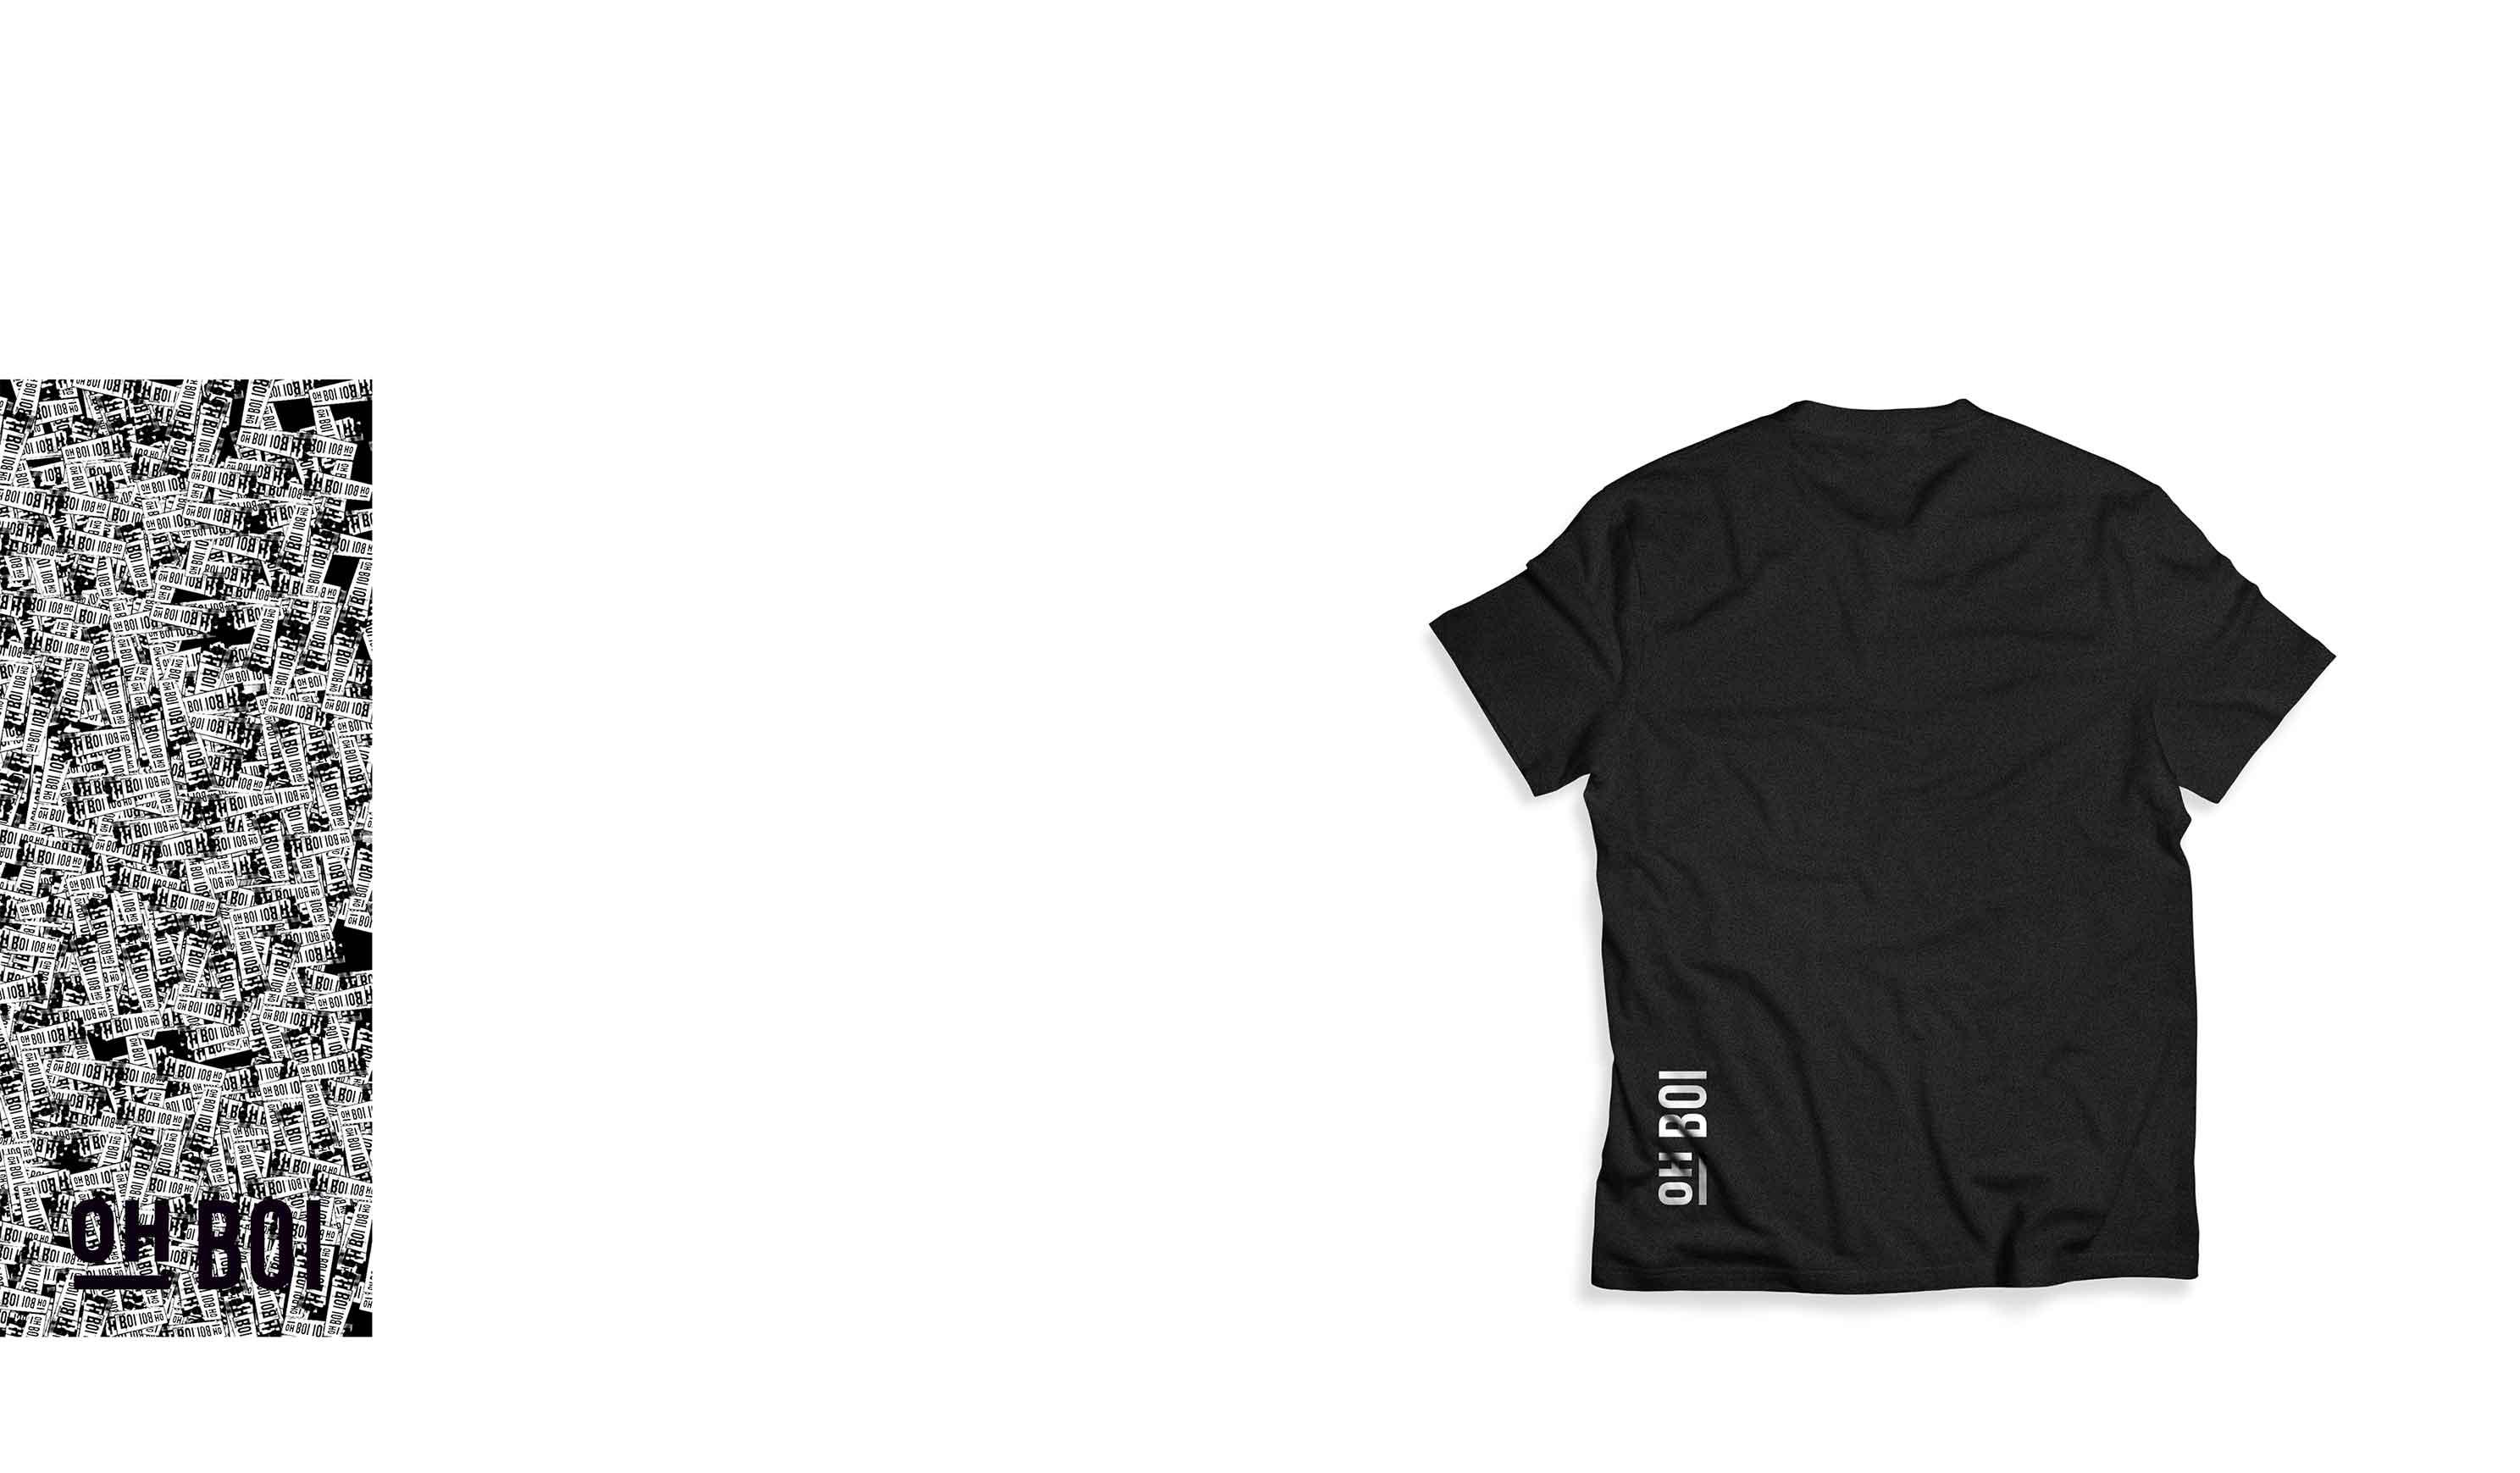 13-oh-boi-bar-food-augsburg-branding-design-t-shirt-back